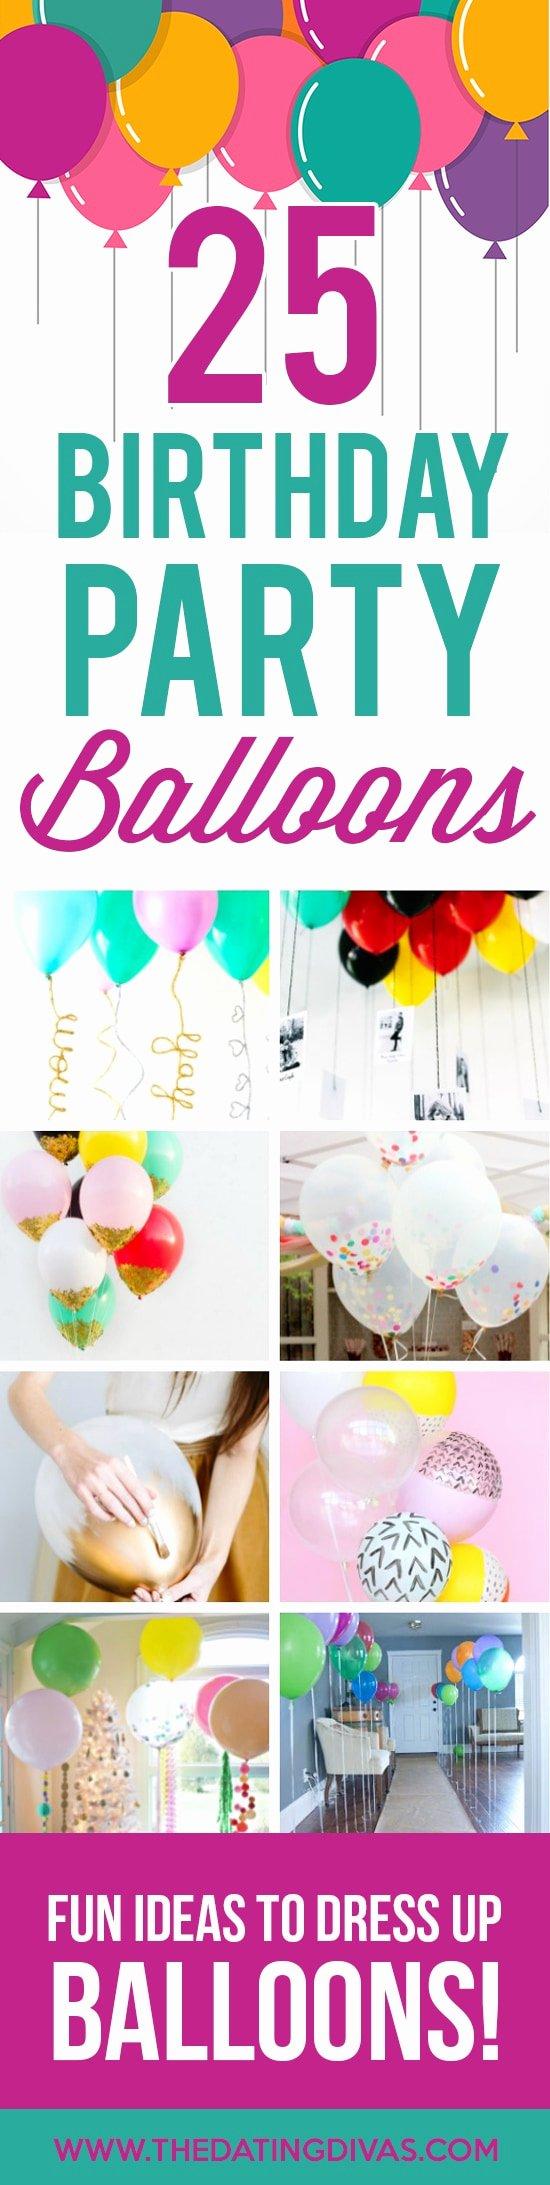 Happy Birthday Decoration Ideas at Home New 100 Birthday Party Decoration Ideas the Dating Divas